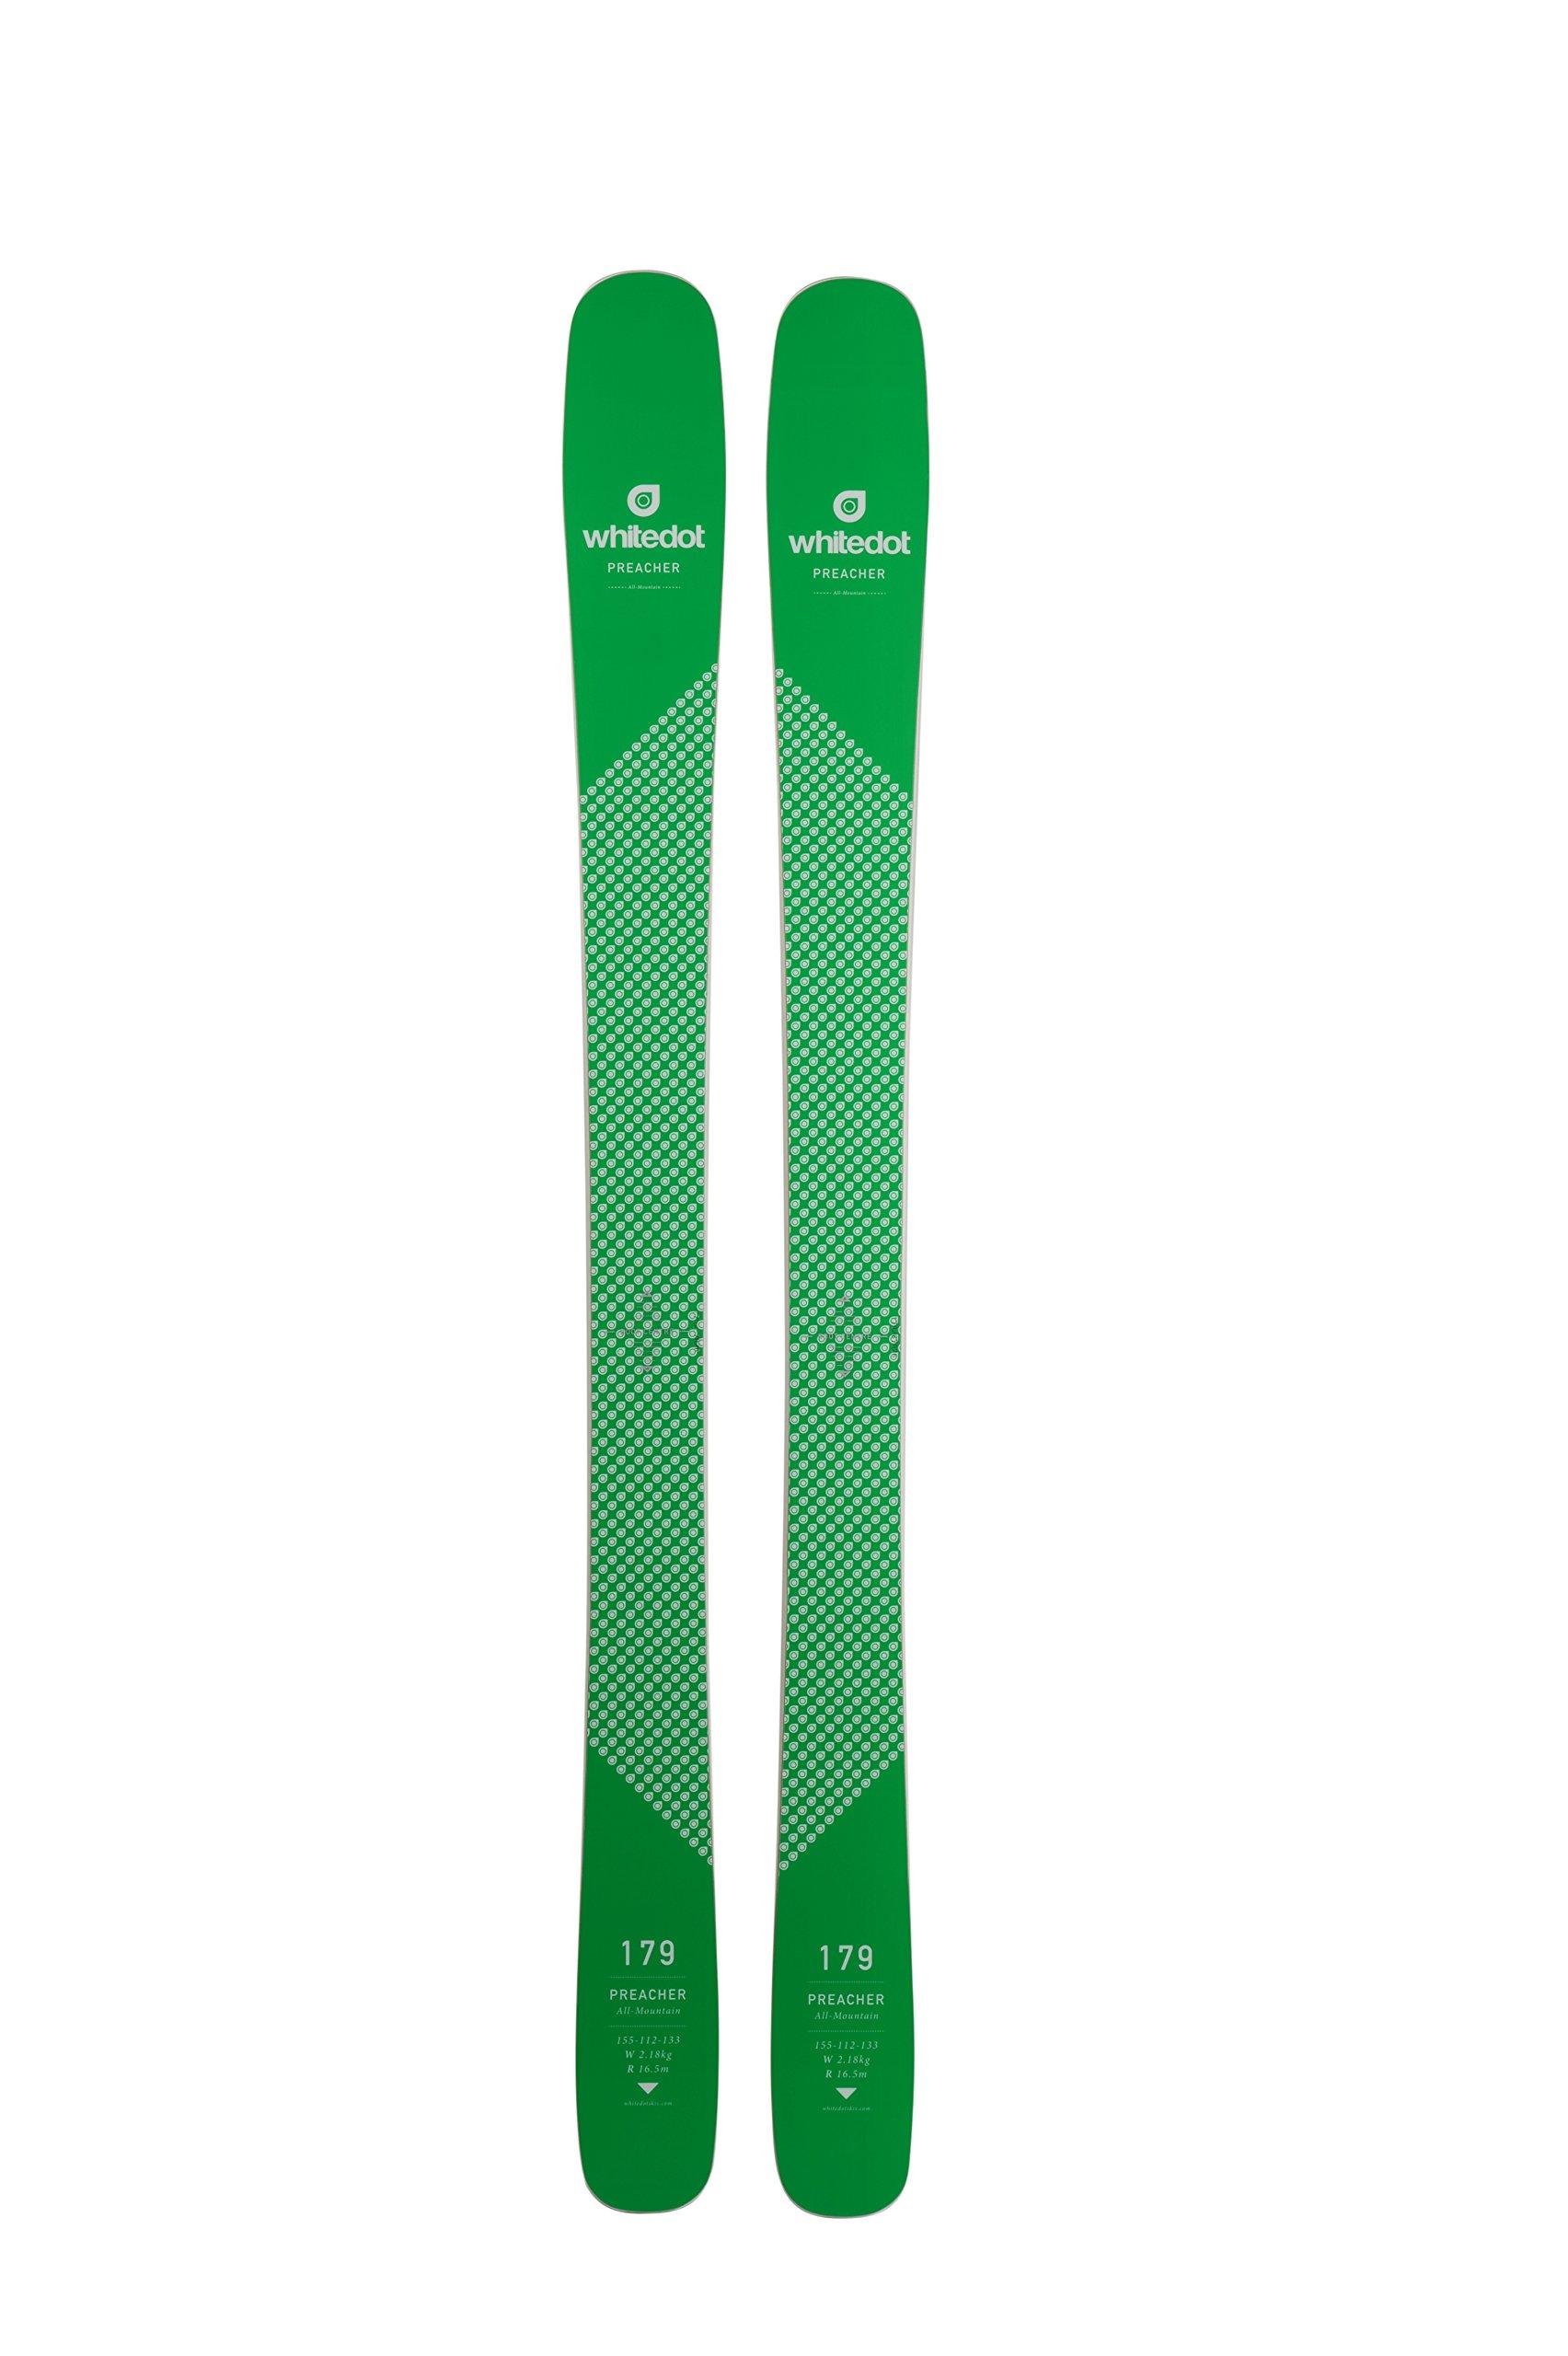 Whitedot Skis Preacher Alpine Skis